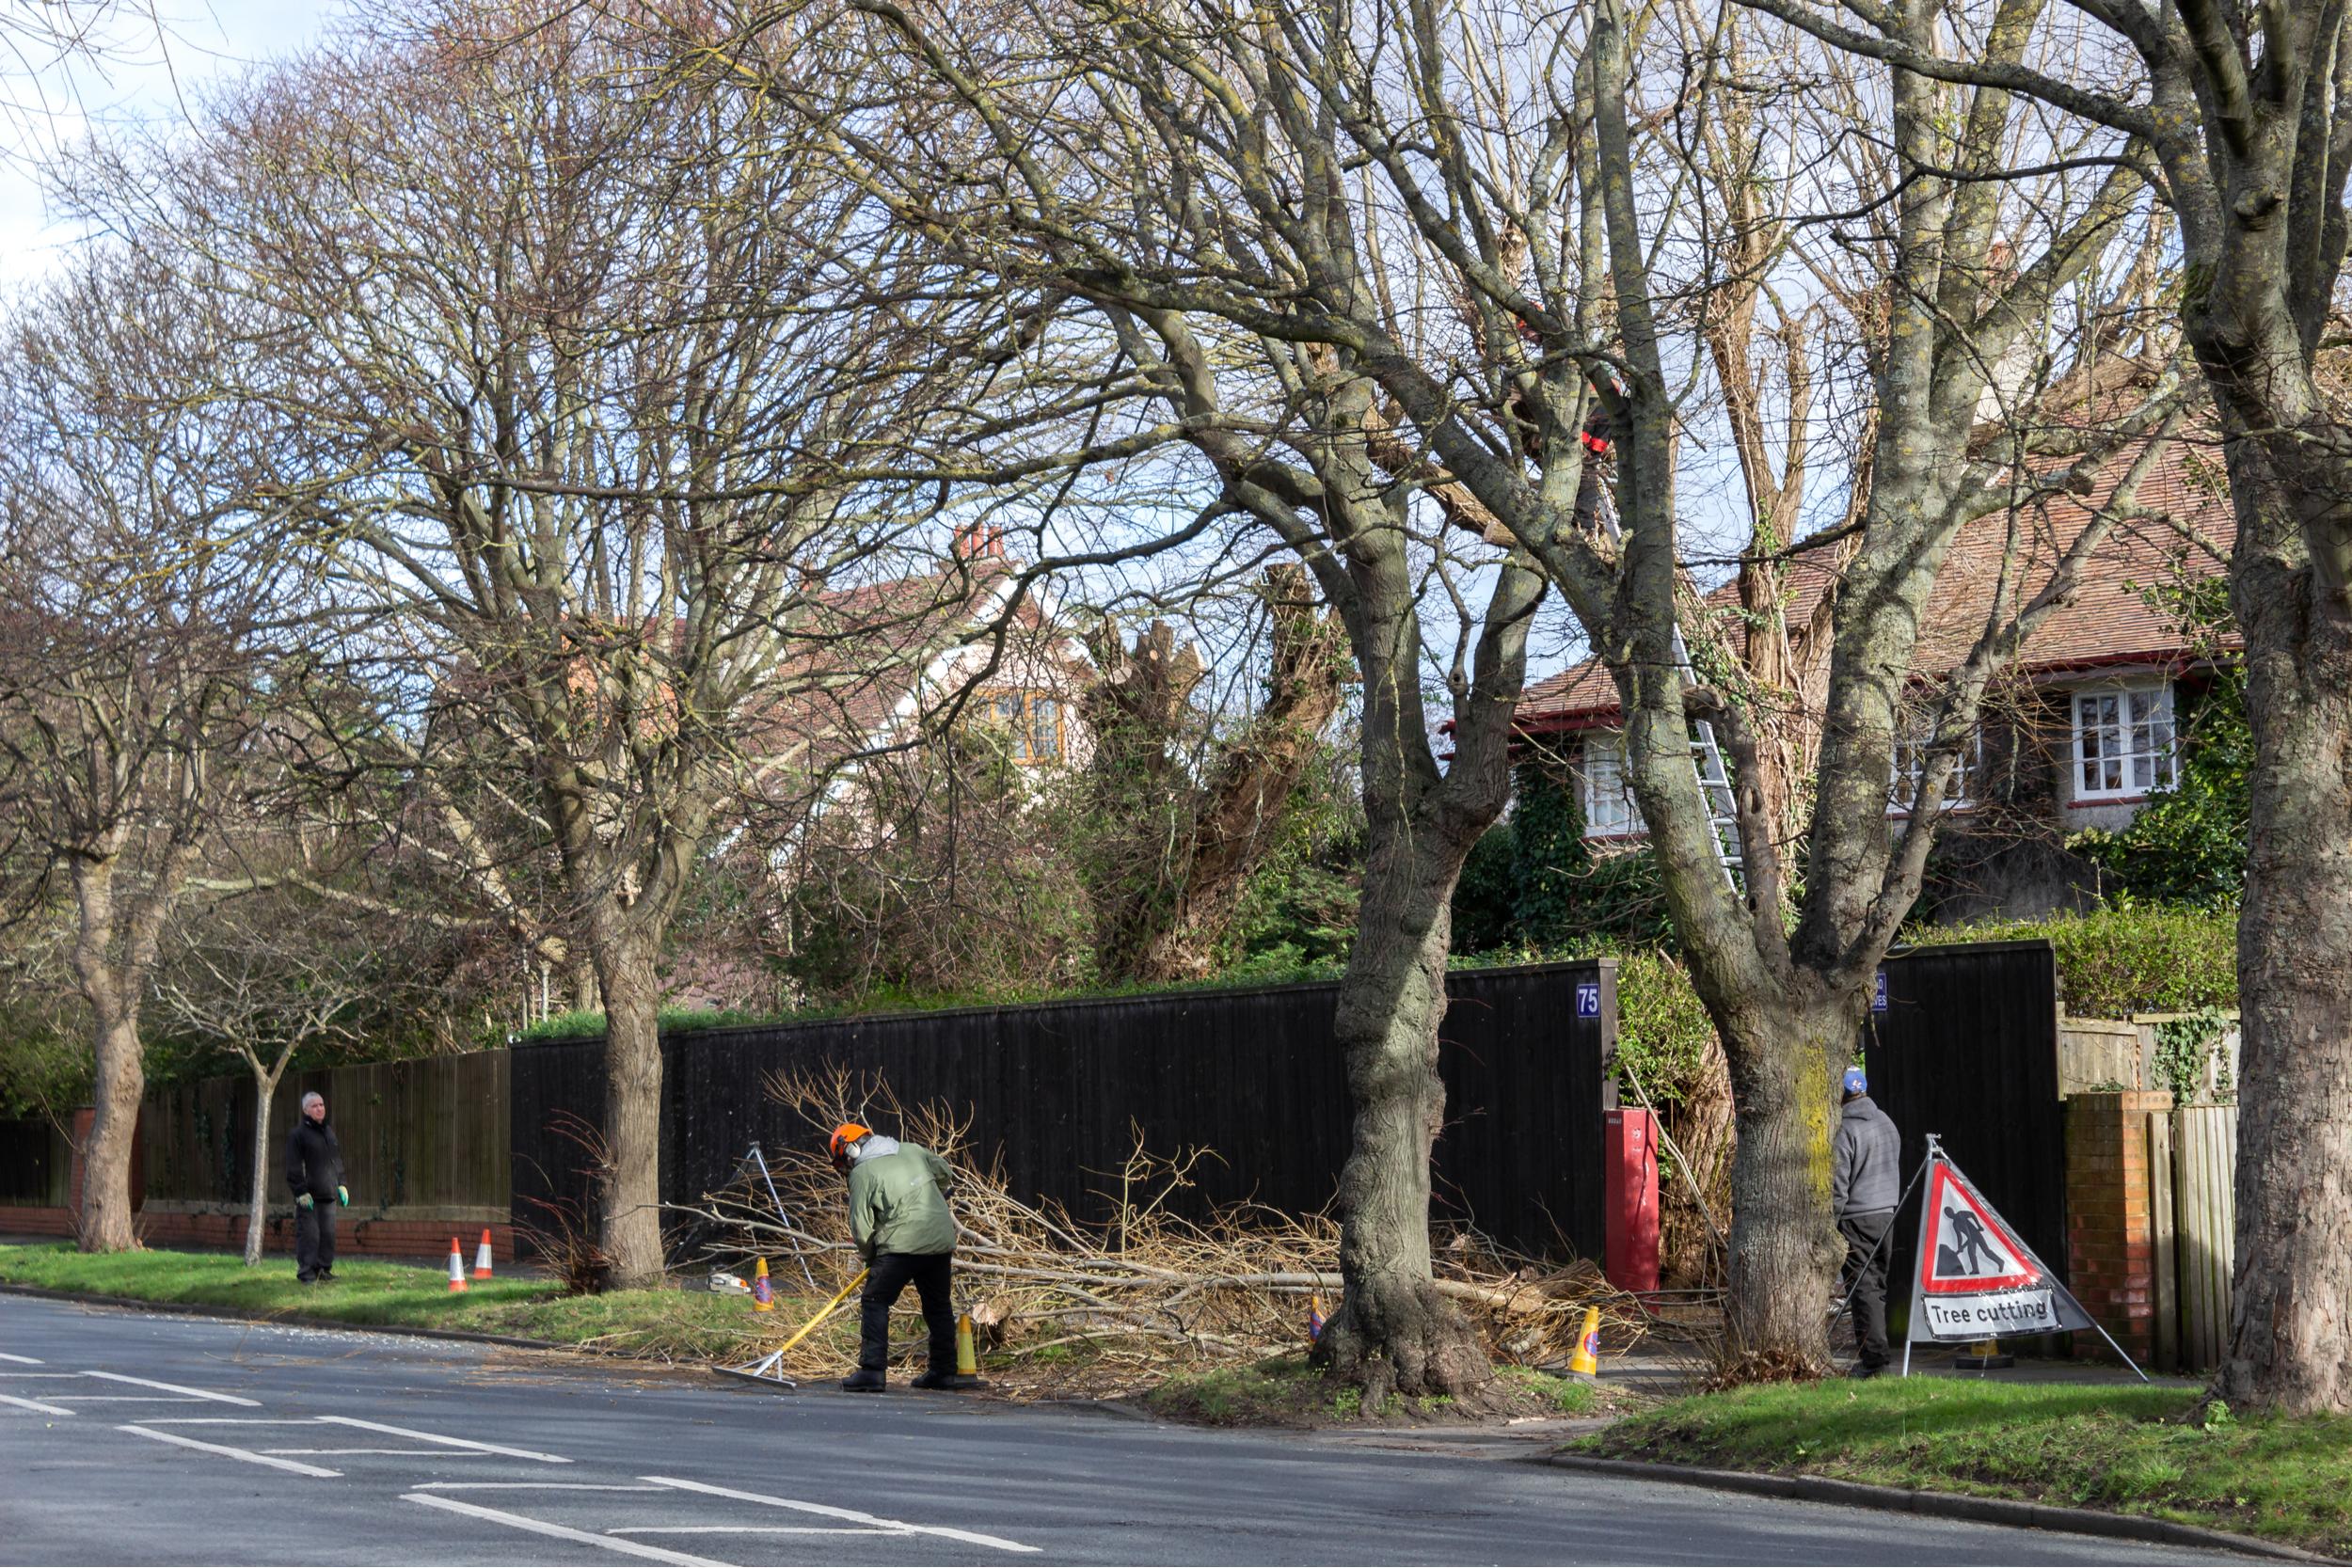 tree-surgeons-in-tunbridge-wells